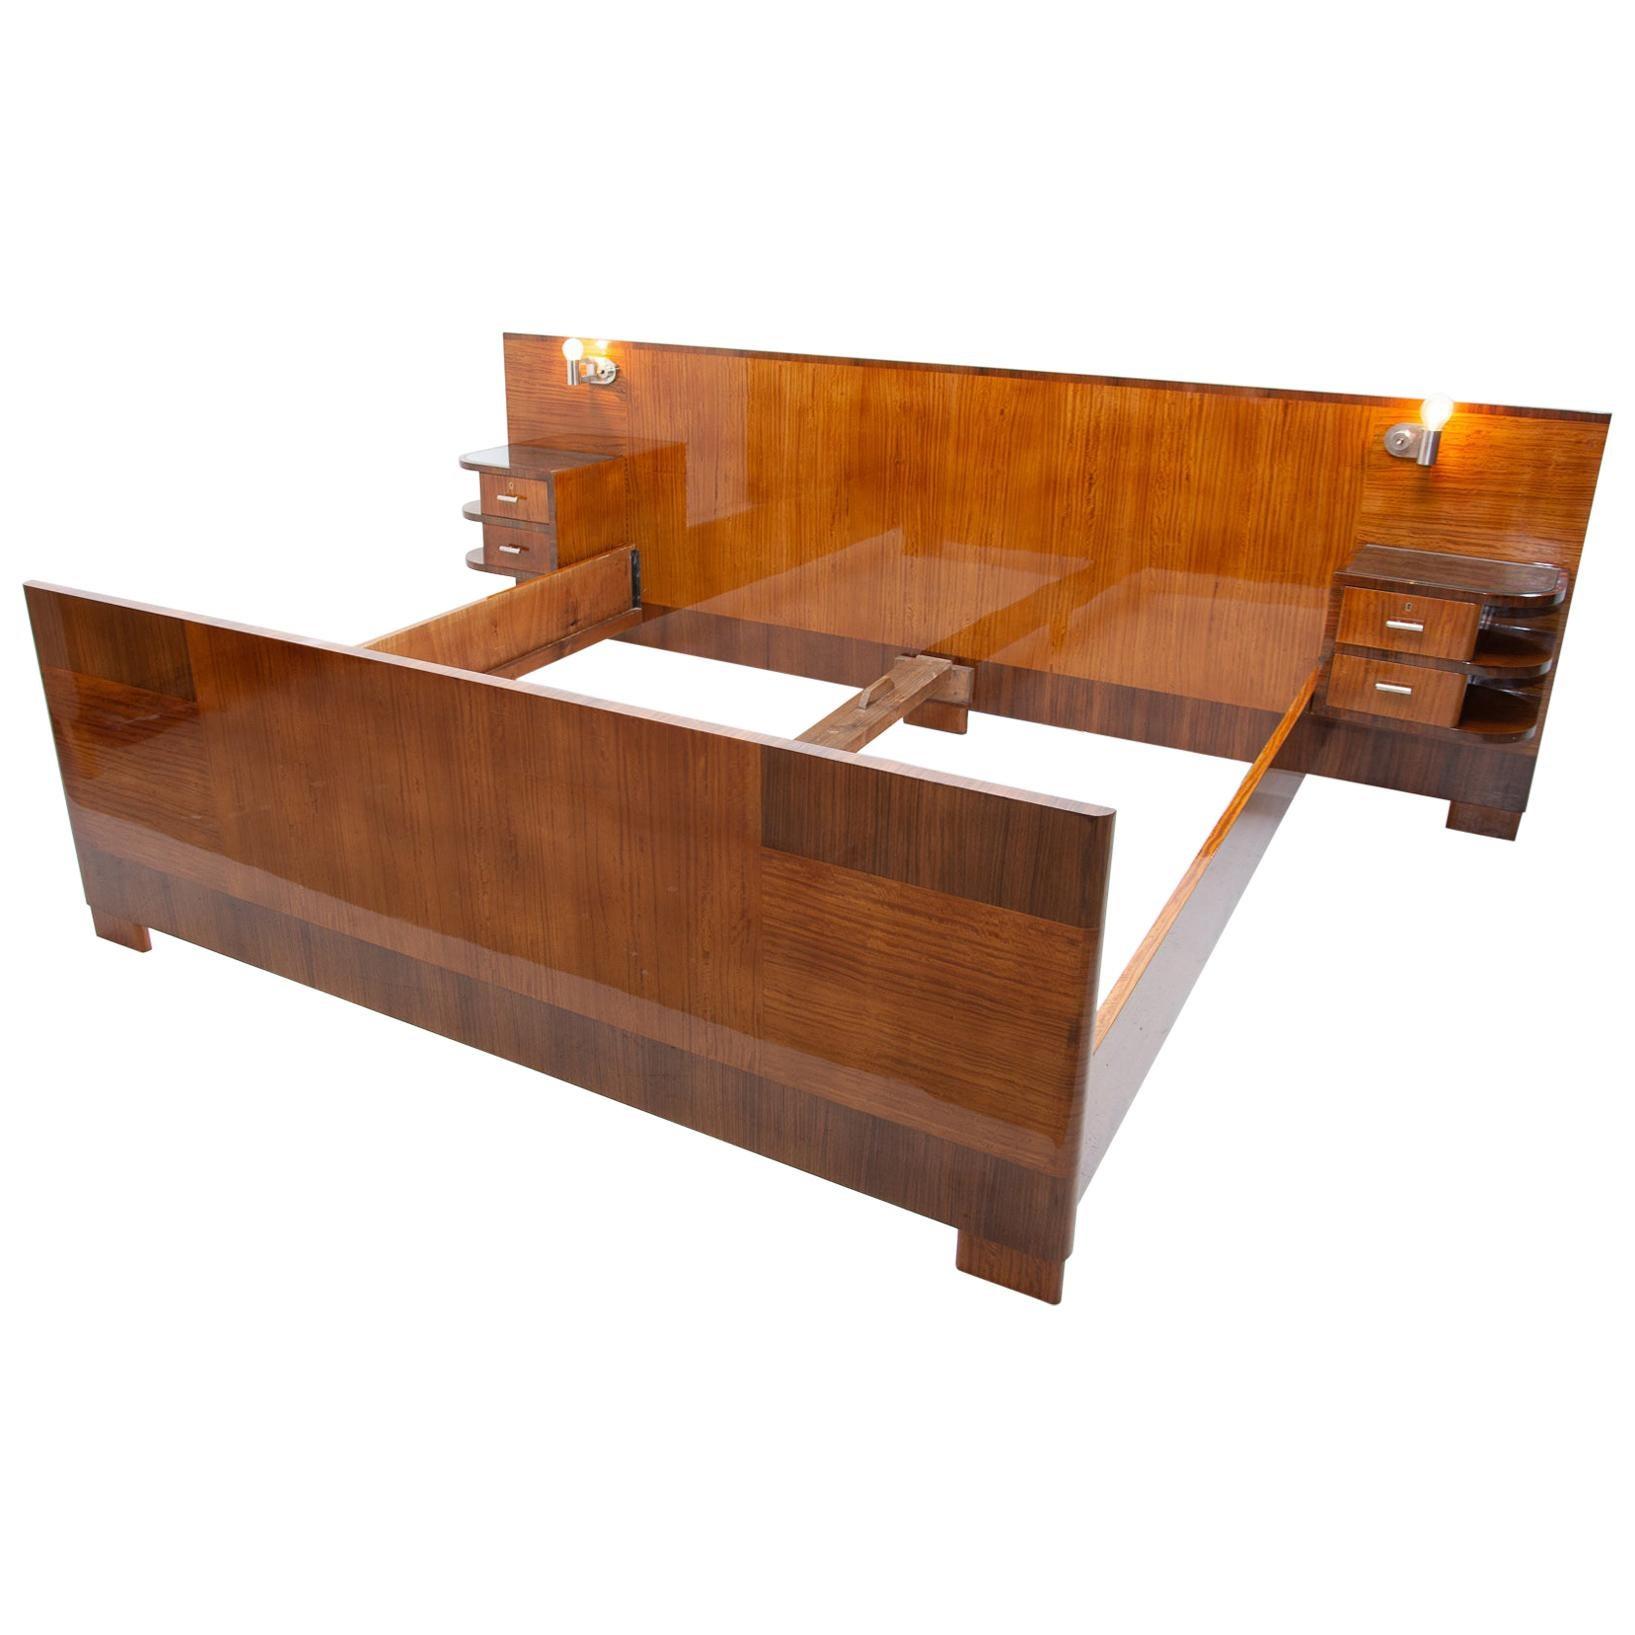 Functionalist Double Bed with Nightstands by Vlastimil Brozek, 1930s